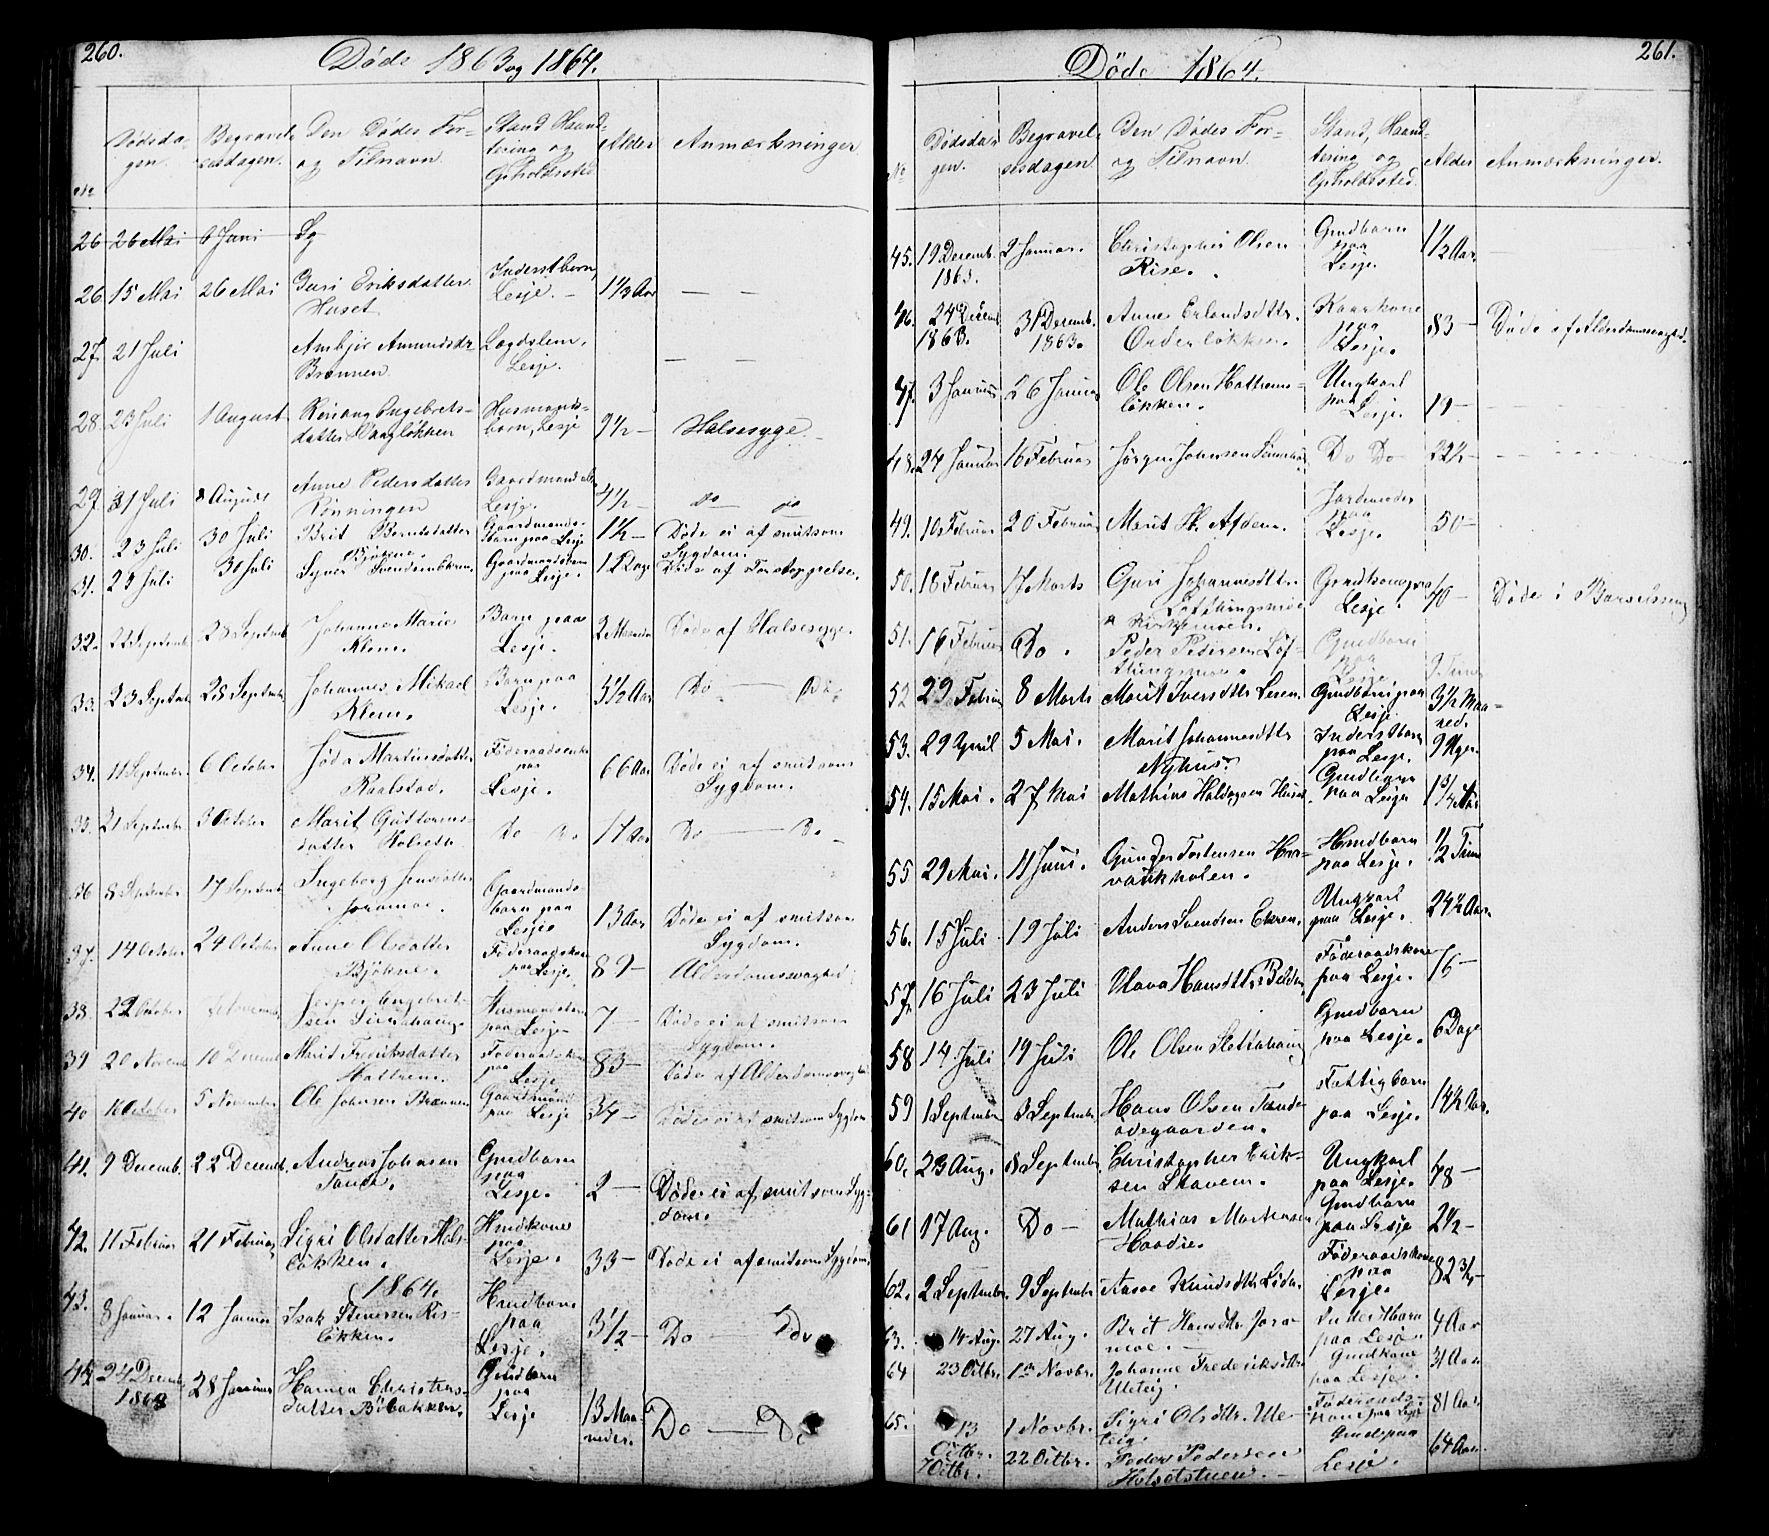 SAH, Lesja prestekontor, Klokkerbok nr. 5, 1850-1894, s. 260-261